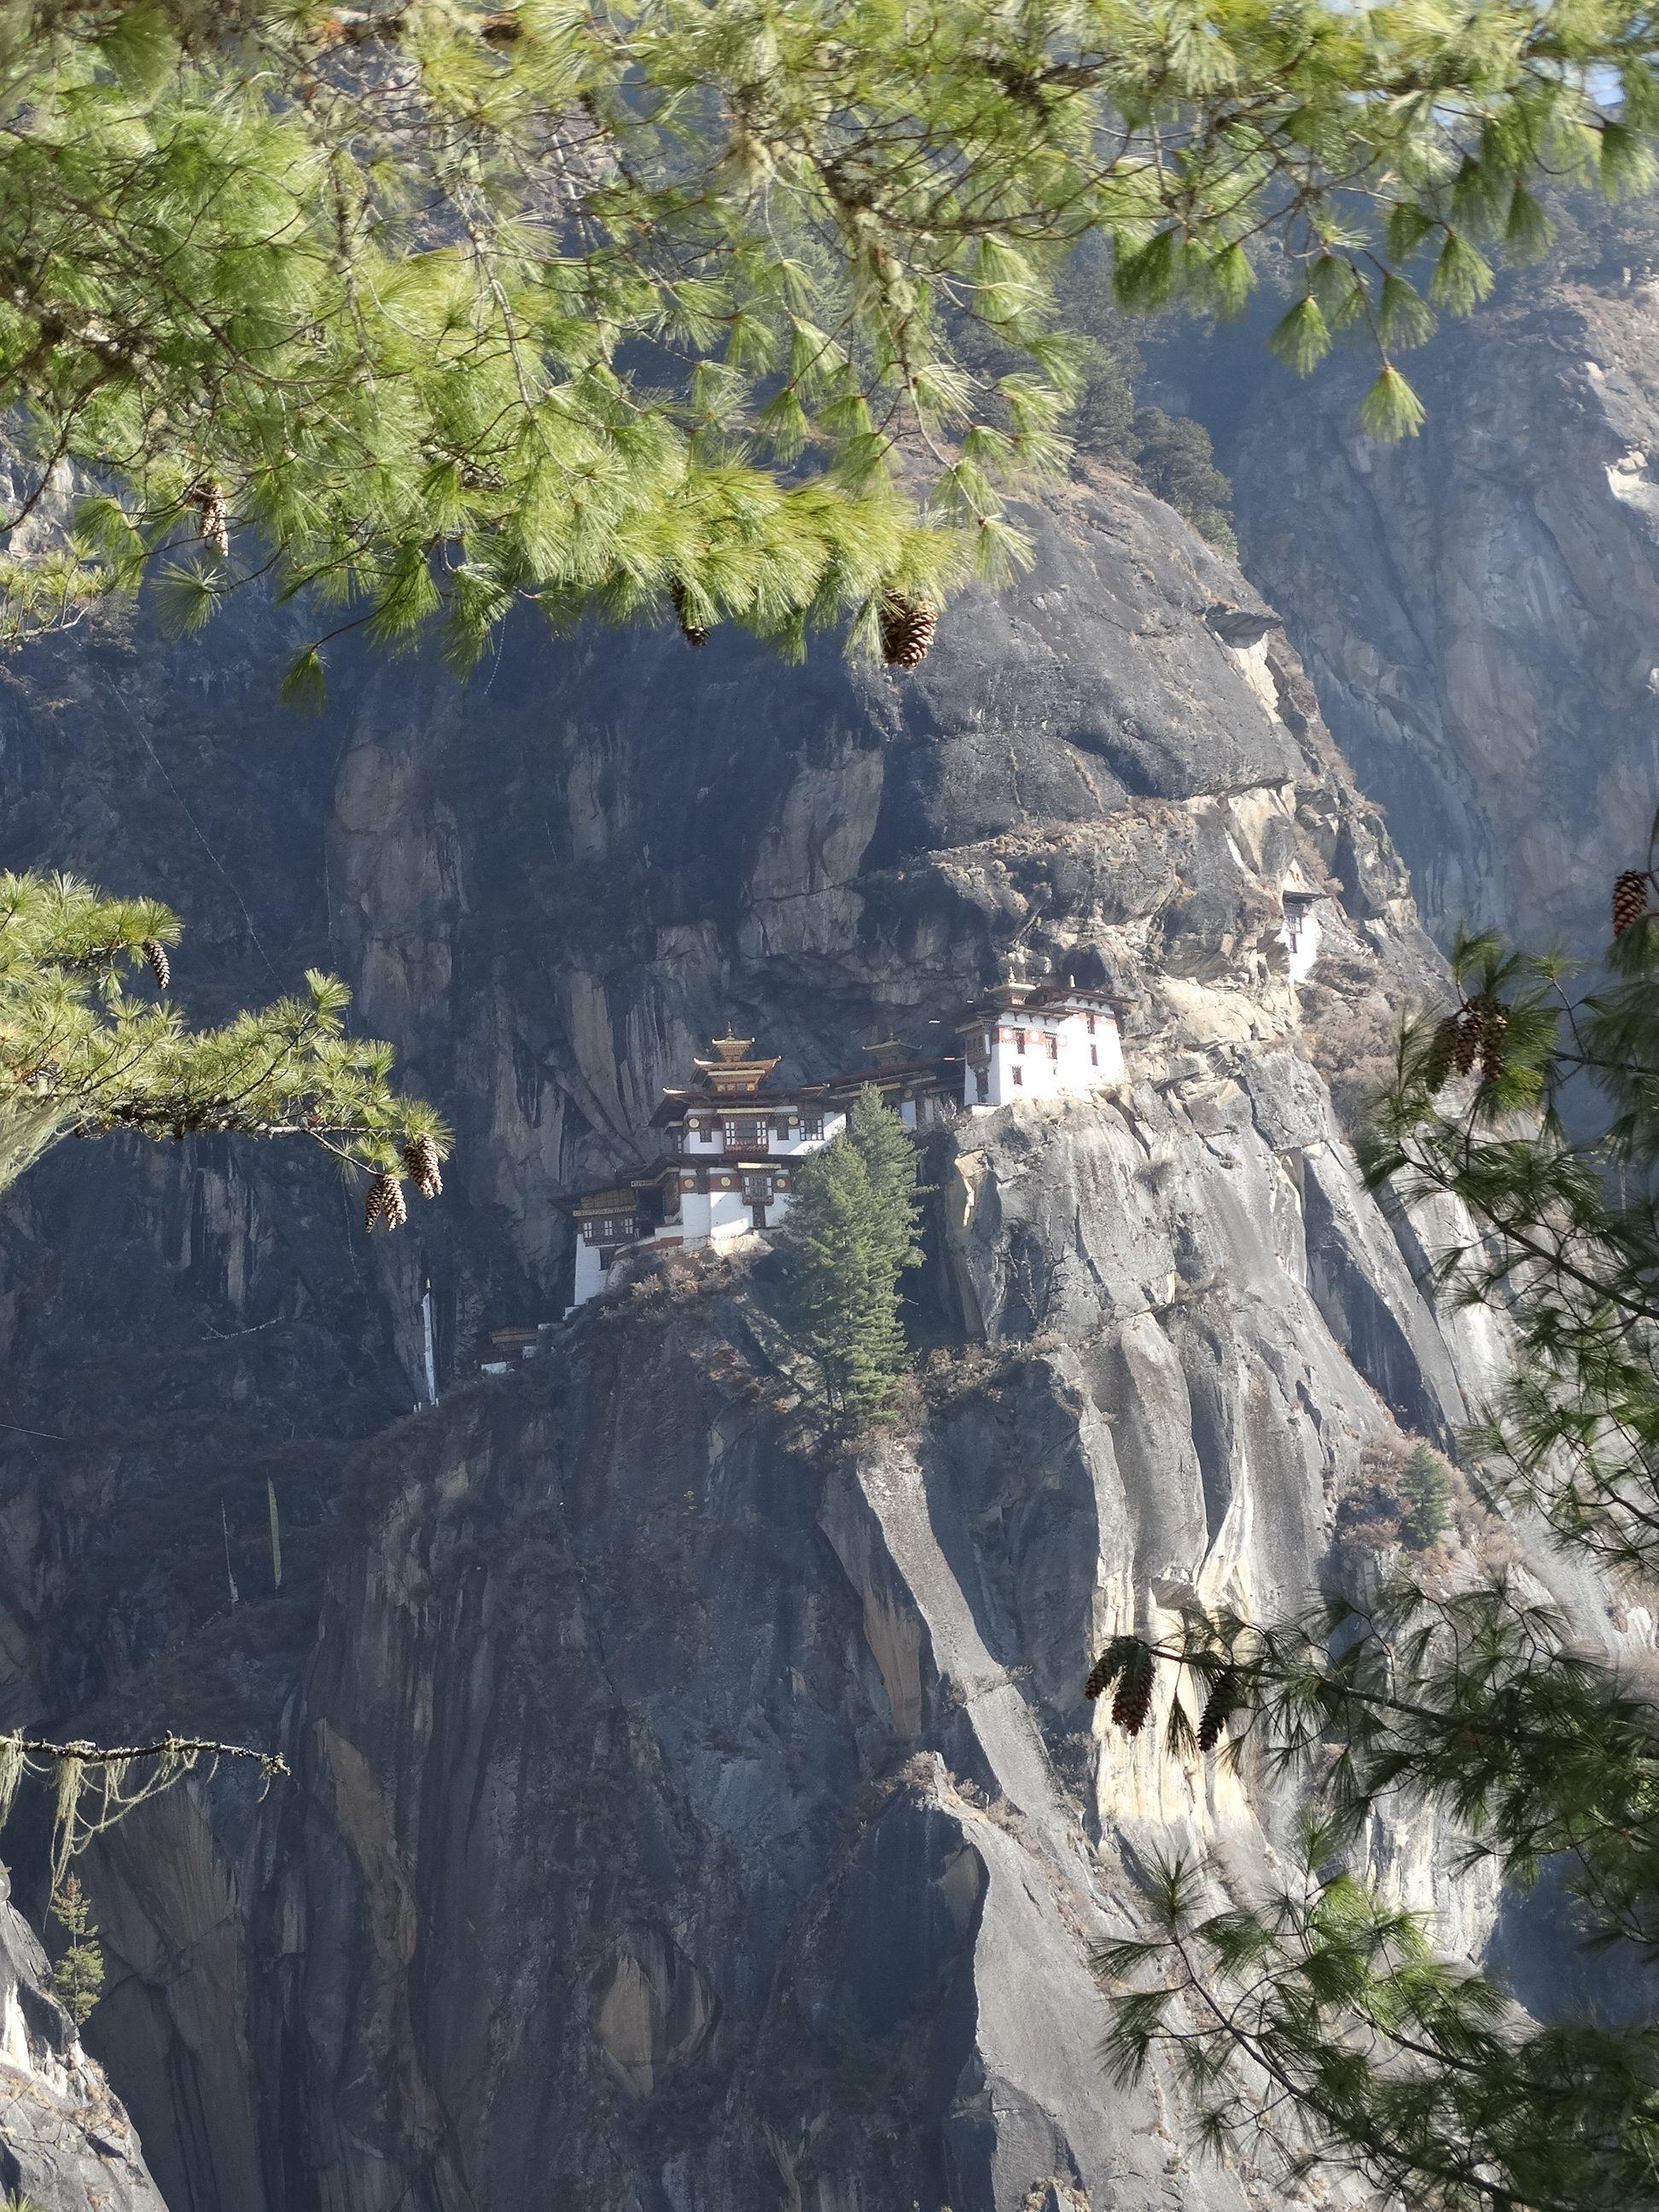 Taktshang Goemba o Monasterio del Nido del tigre, Bhutan